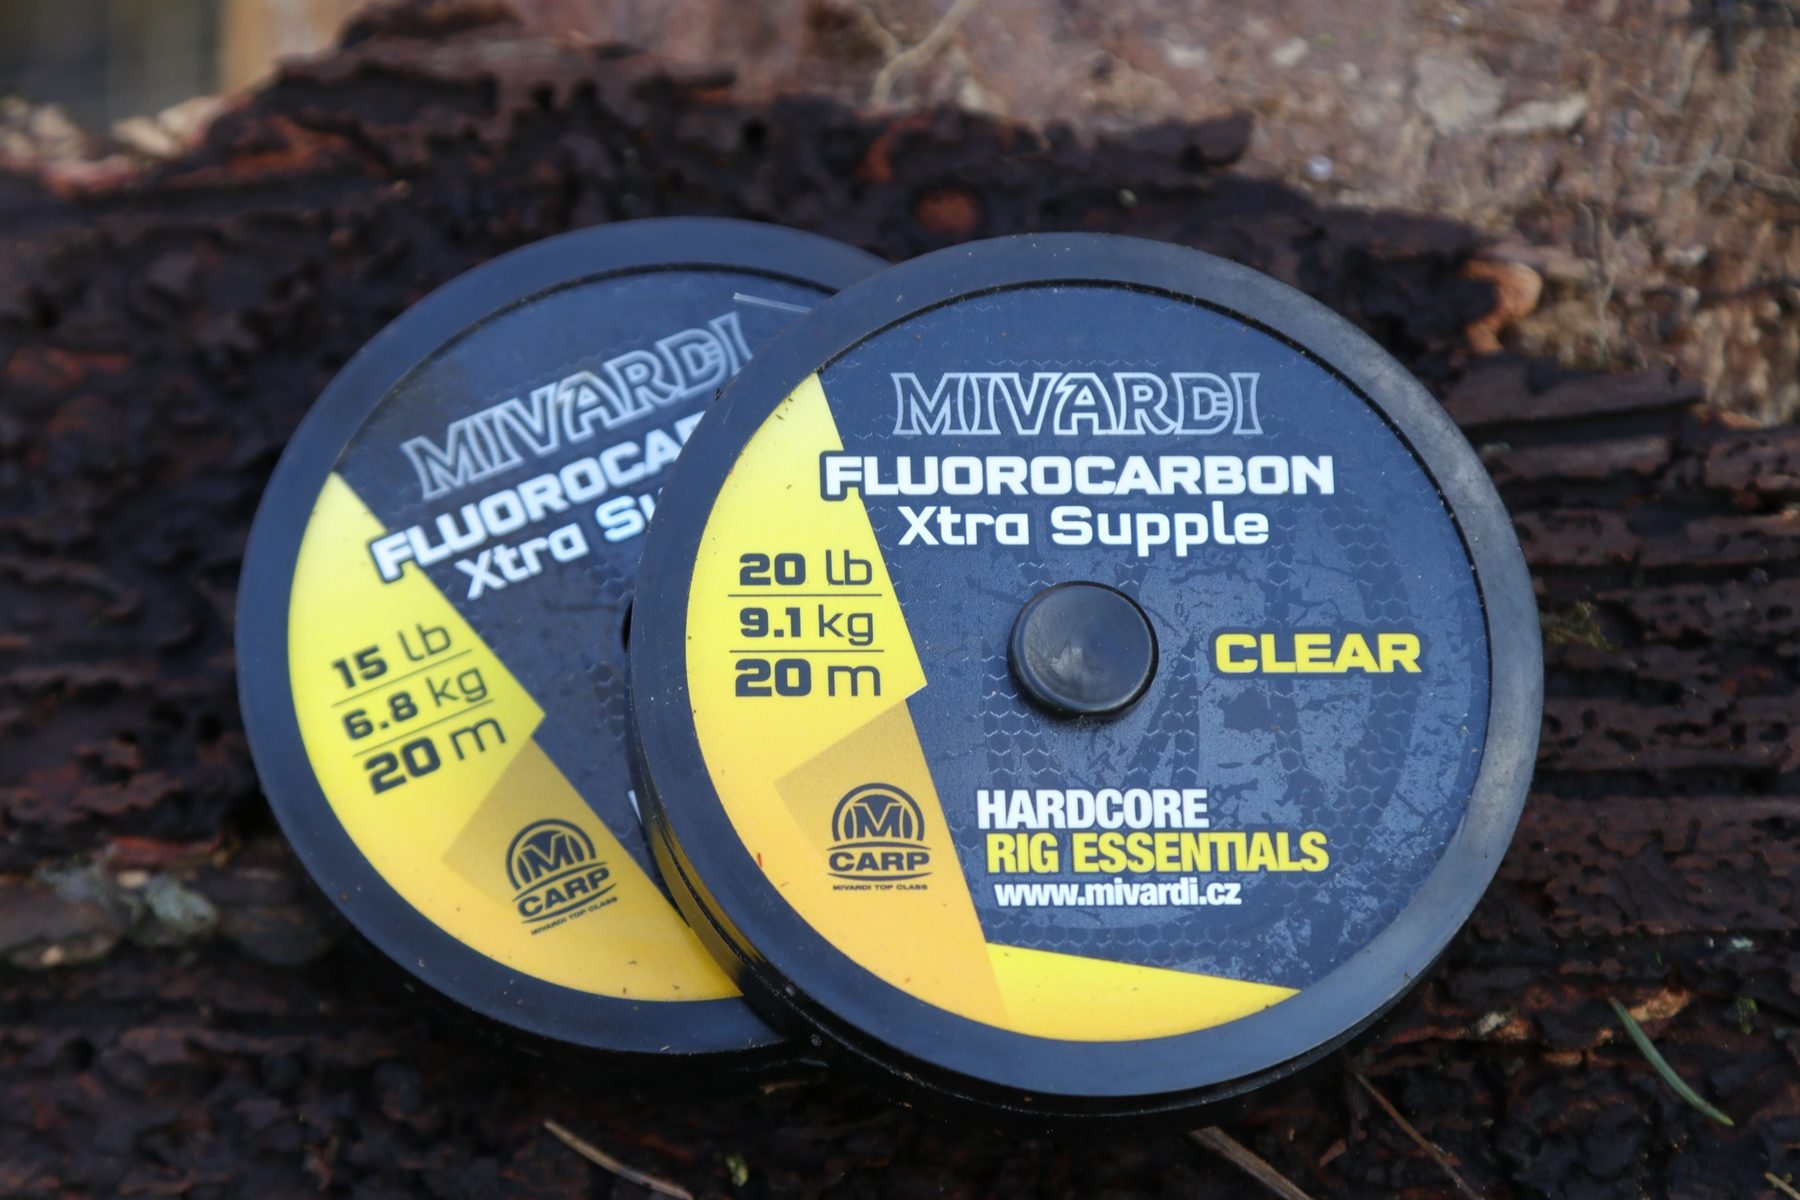 Fluorocarbon Mivardi Xtra Supple 20m/15lb